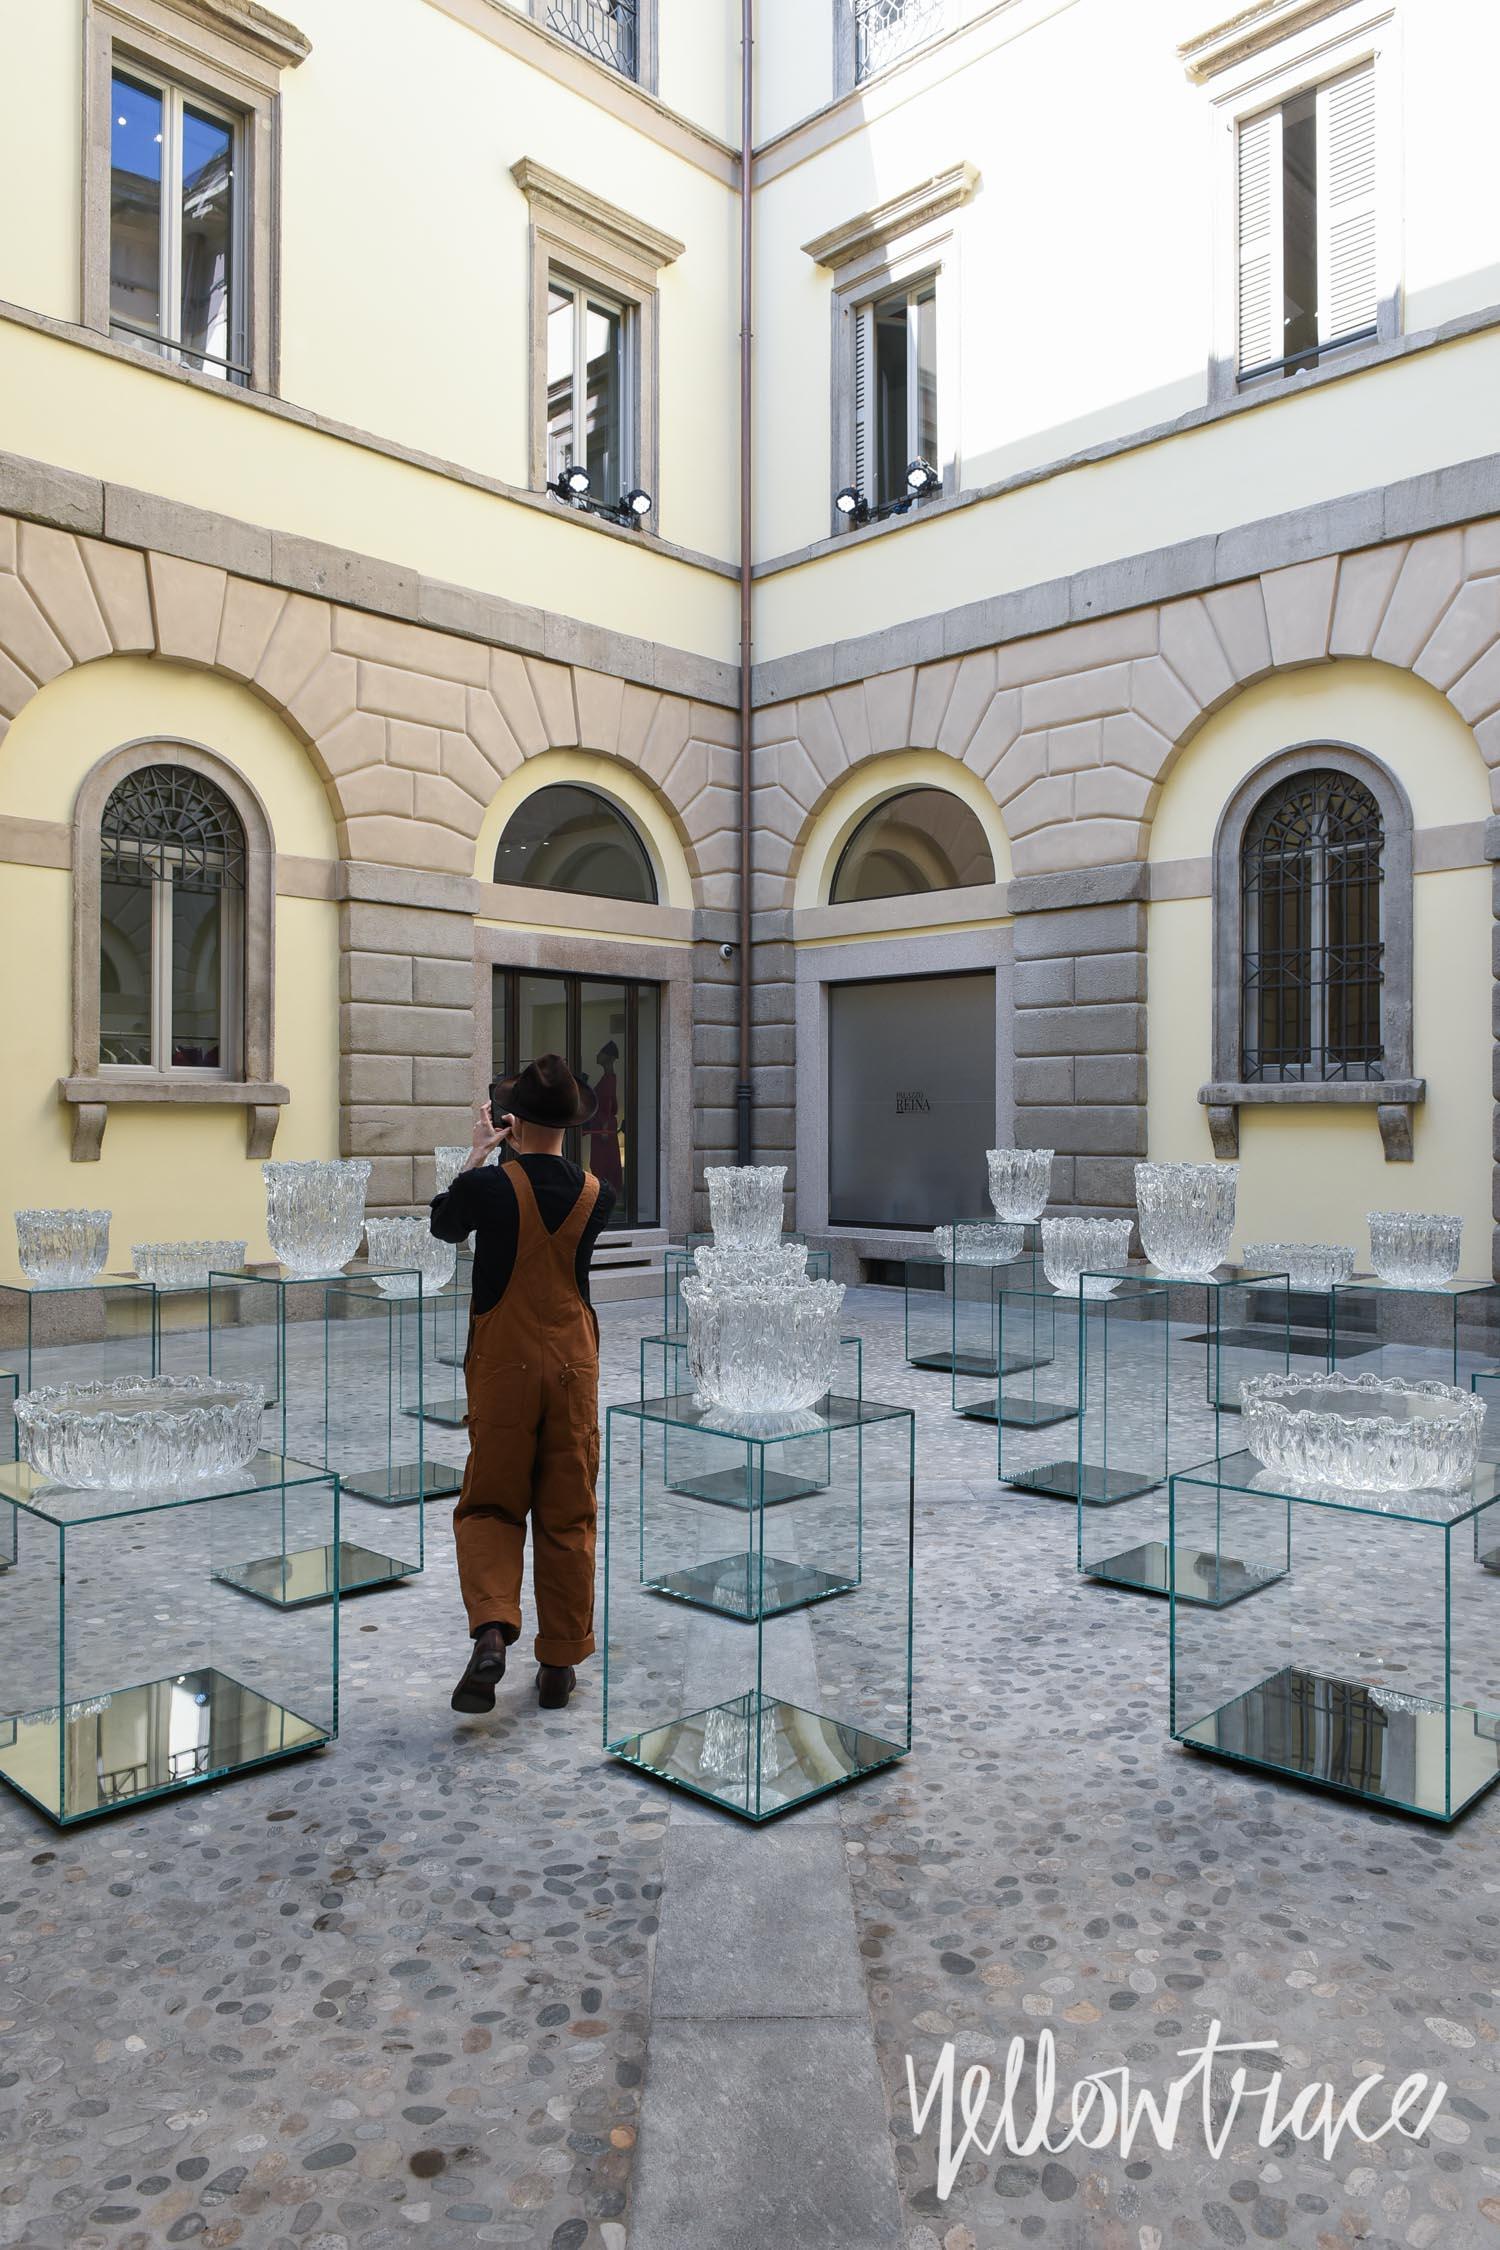 Milan Design Week 2017 Highlights, Glass Fountain by Tokujin Yoshioka at Issey Miyake flagship, Photo © Nick Hughes | #Milantrace2017